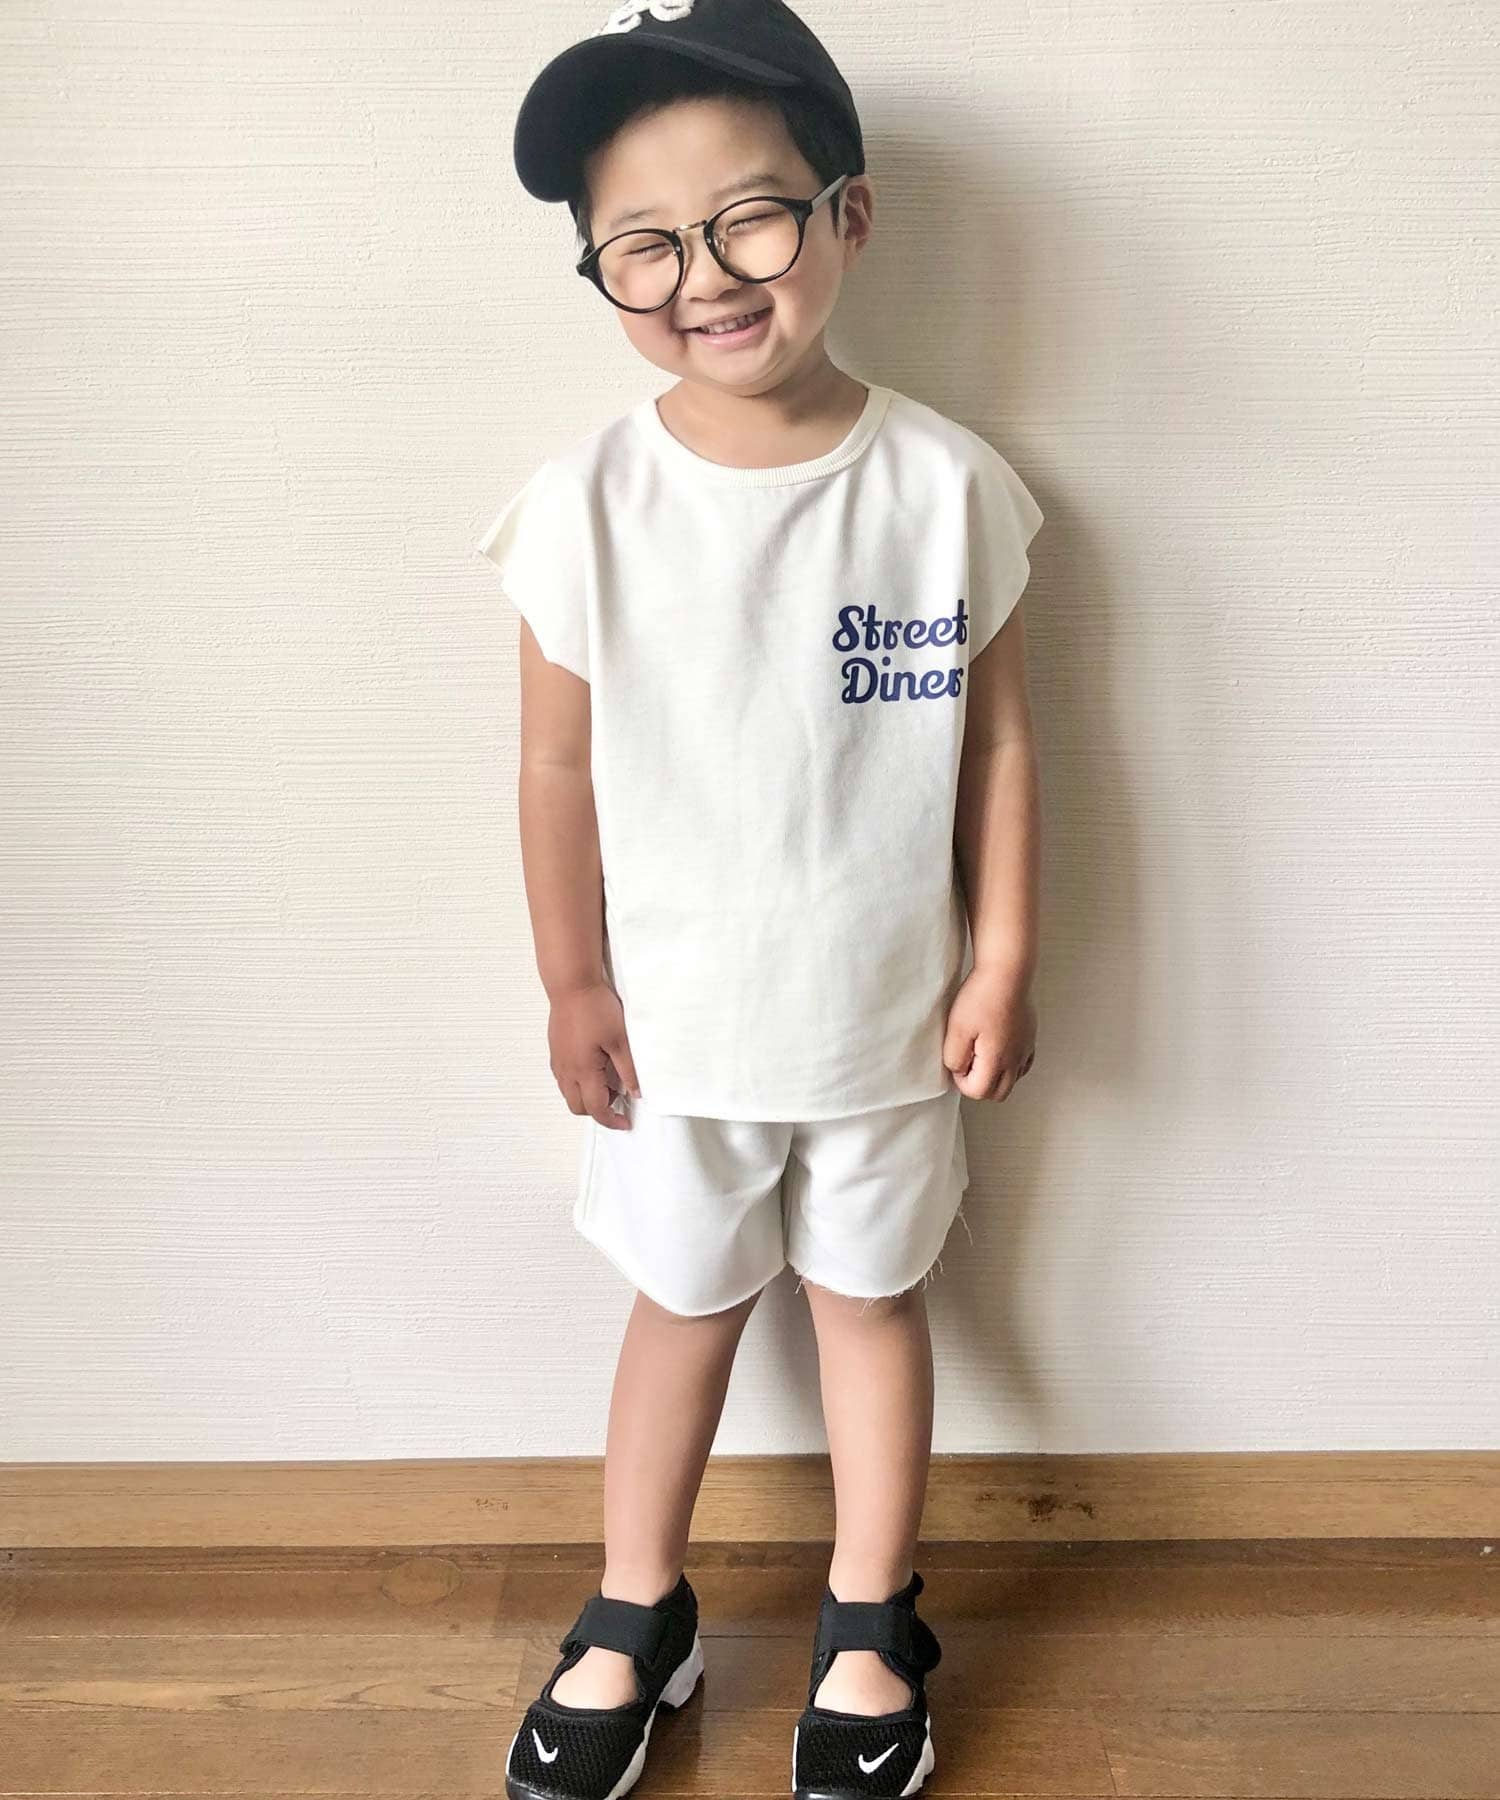 CIAOPANIC TYPY(チャオパニックティピー) 【KIDS】カレッジロゴ プリントスウェット セットアップ